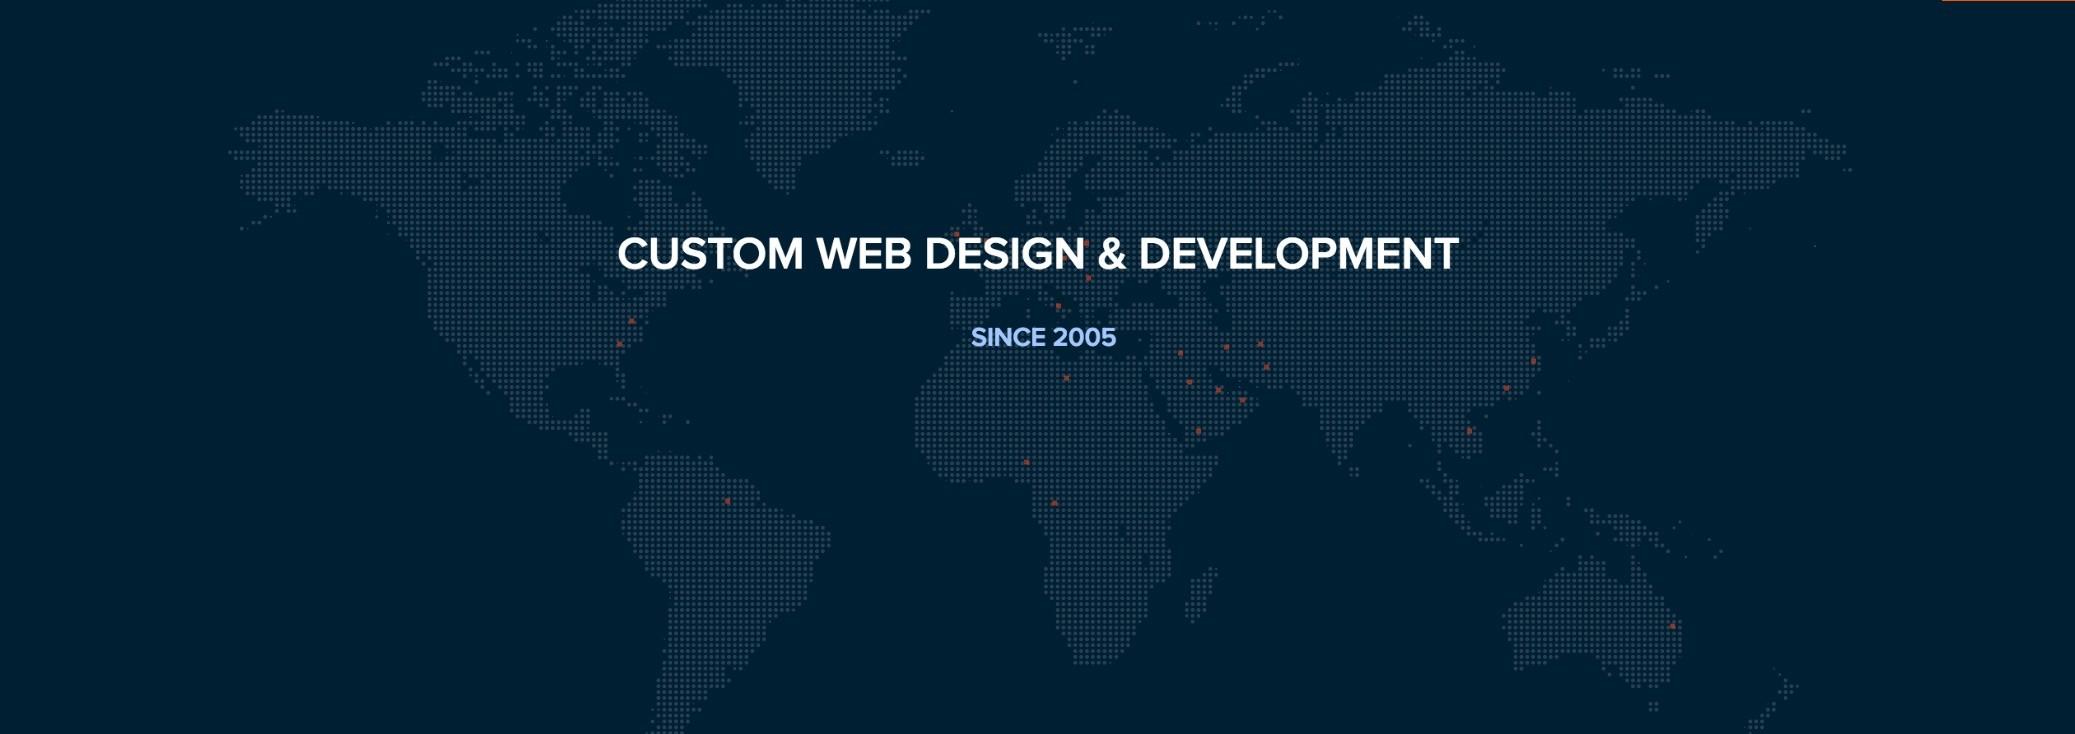 GO-Gulf ™ | CUSTOM WEB DESIGN AND DEVELOPMENT | LinkedIn